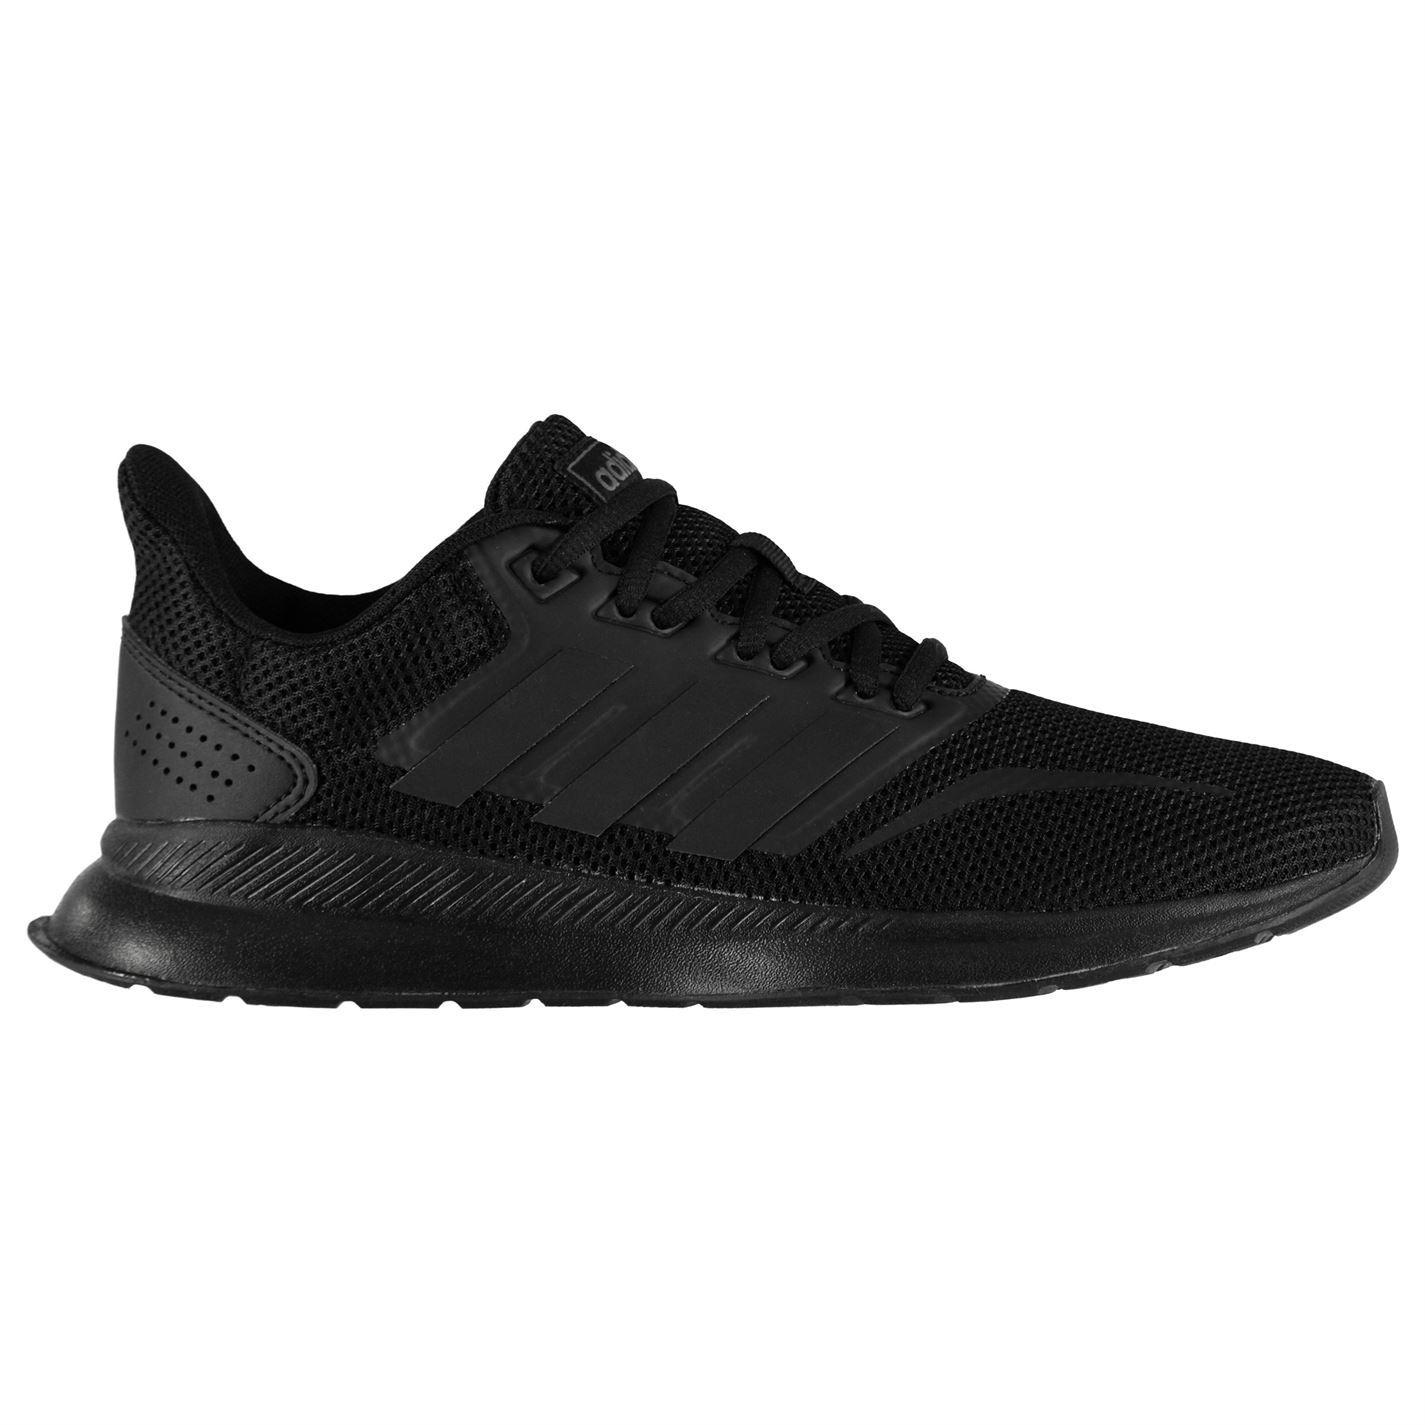 adidas-Falcon-Trainers-Junior-Boys-Shoes-Footwear thumbnail 5